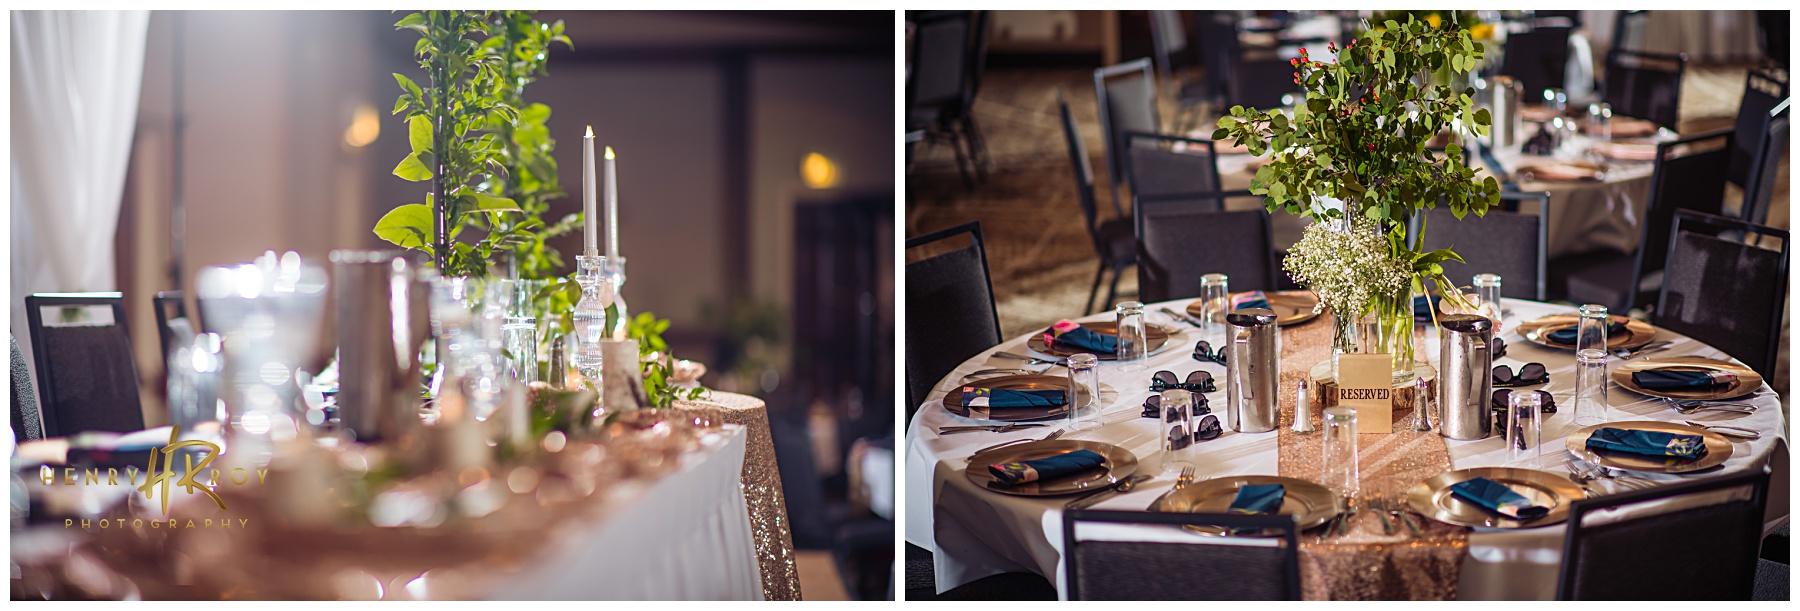 Rapid City Wedding Photographer054.jpg